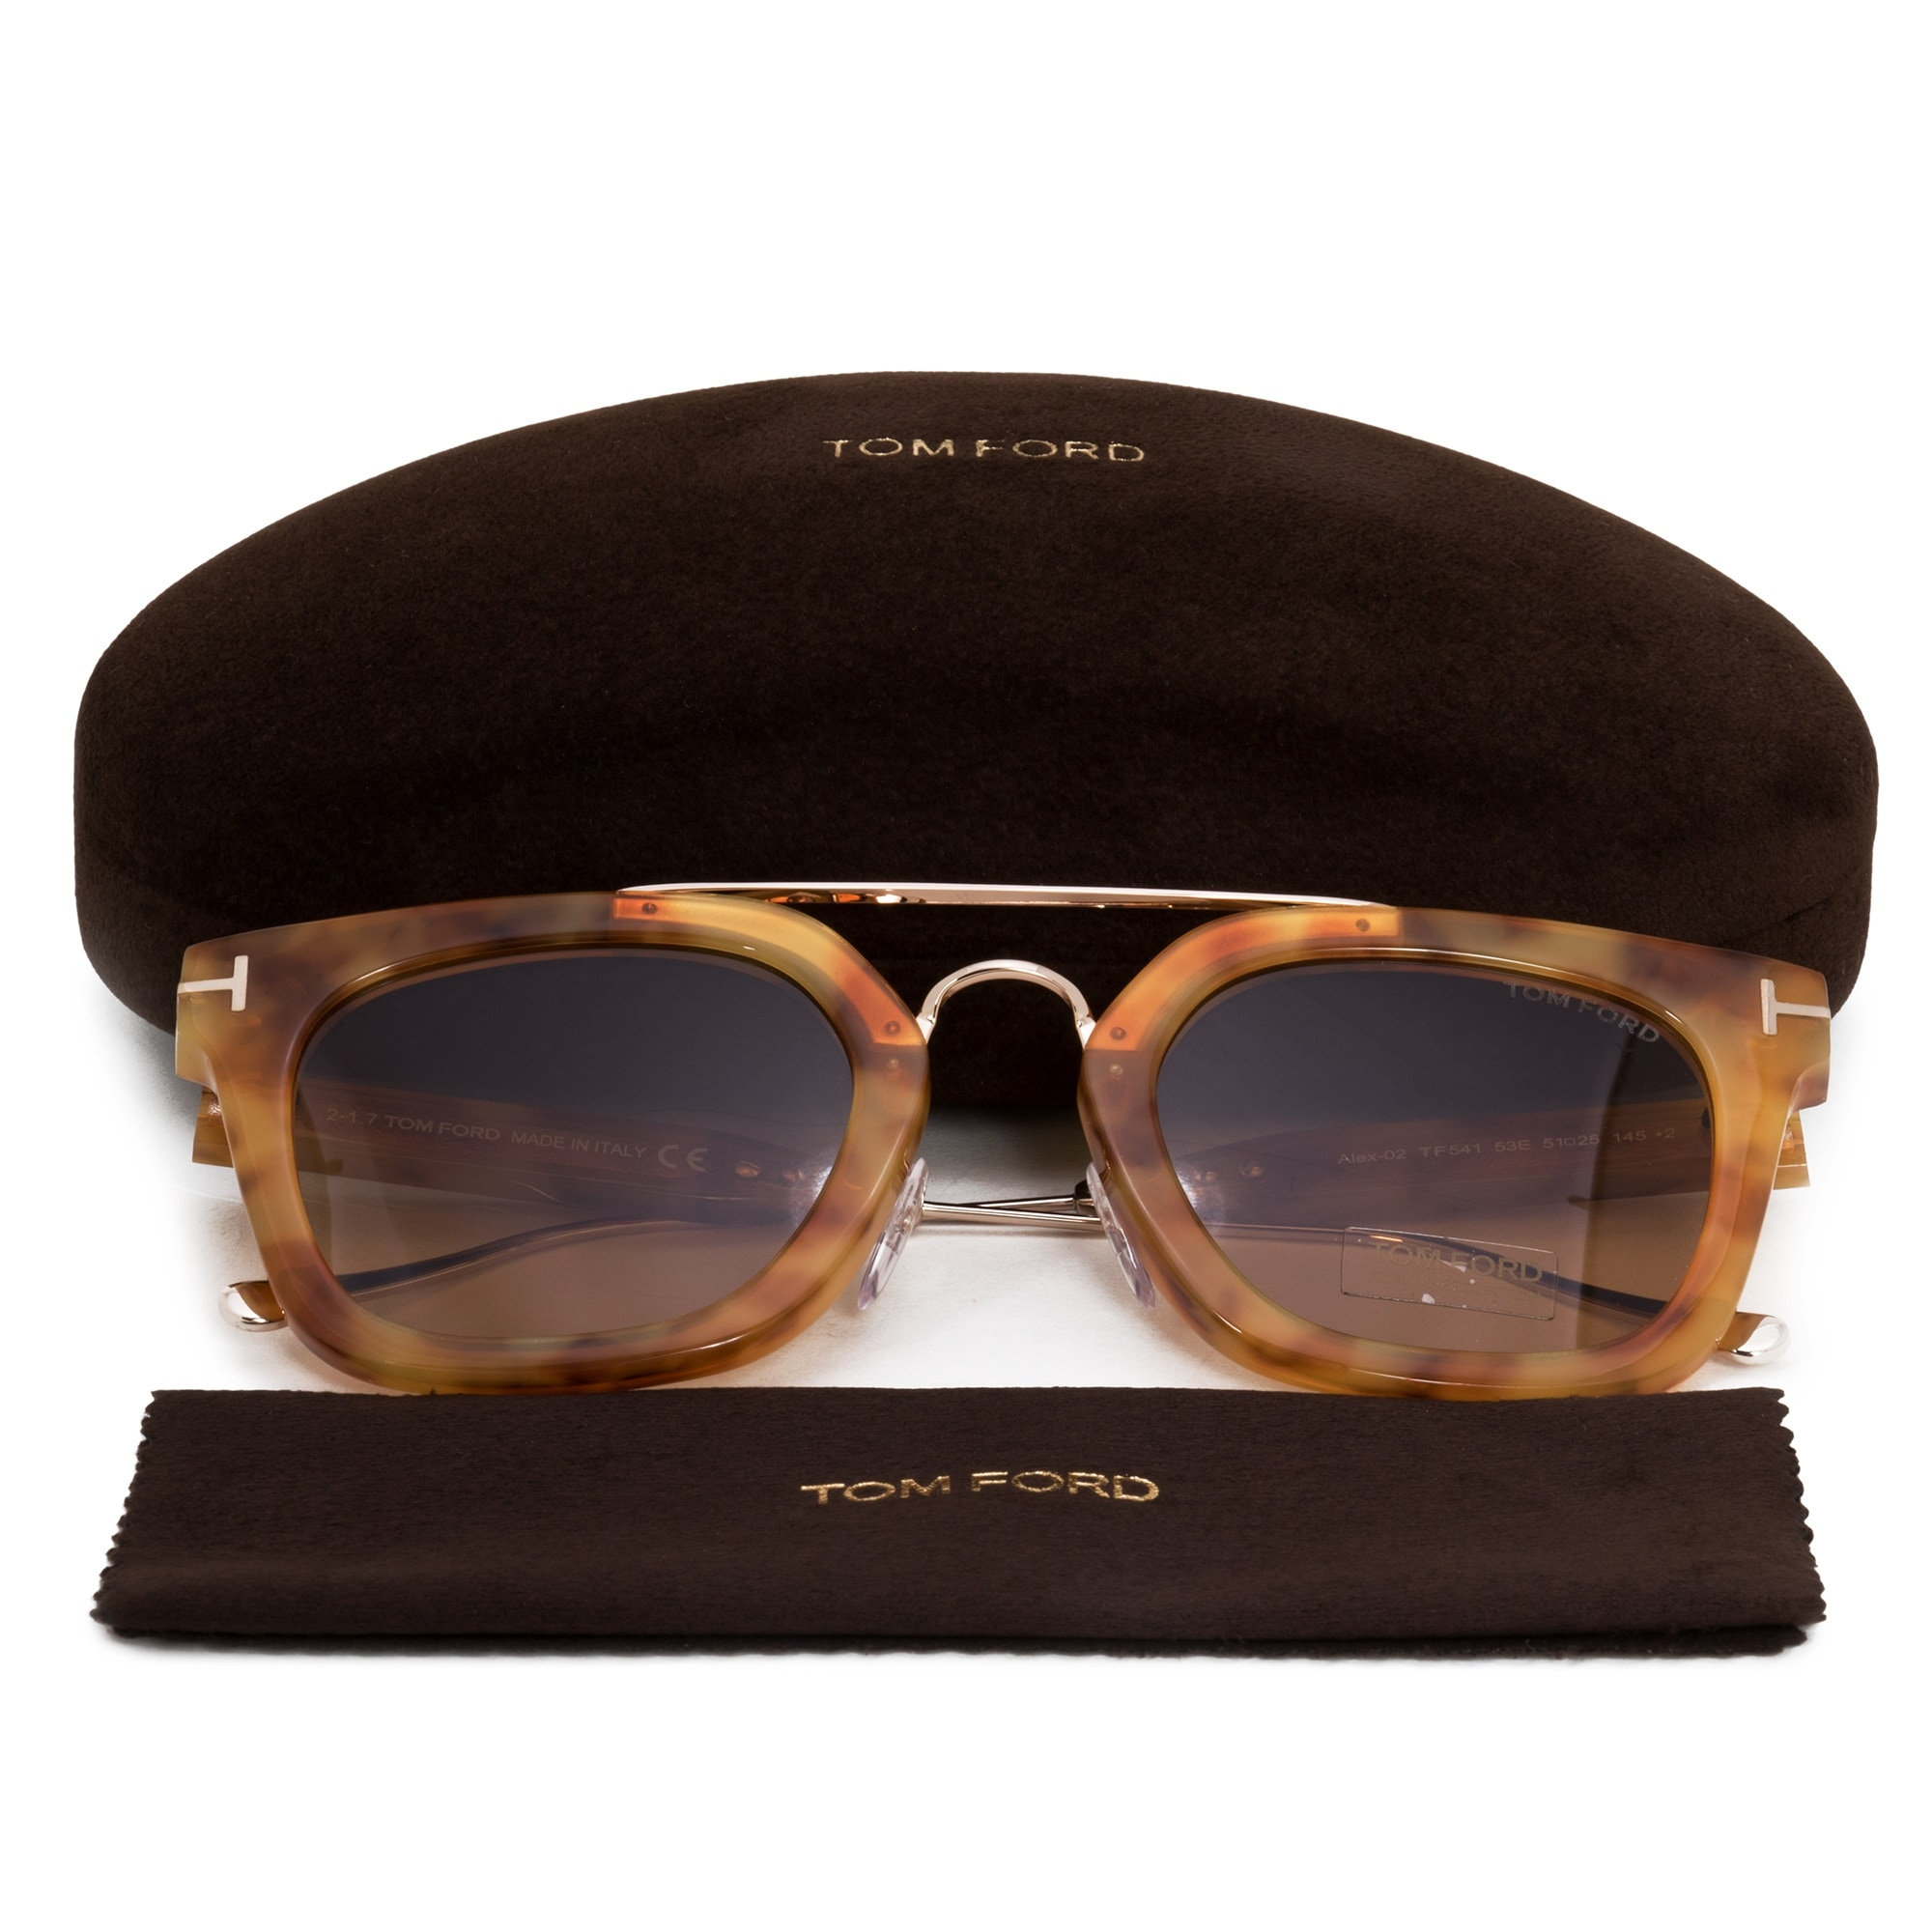 b3fbb15380b9f Shop Tom Ford Alex-02 Wayfarer Sunglasses FT0541 53E 51 - Free Shipping  Today - Overstock - 21408817